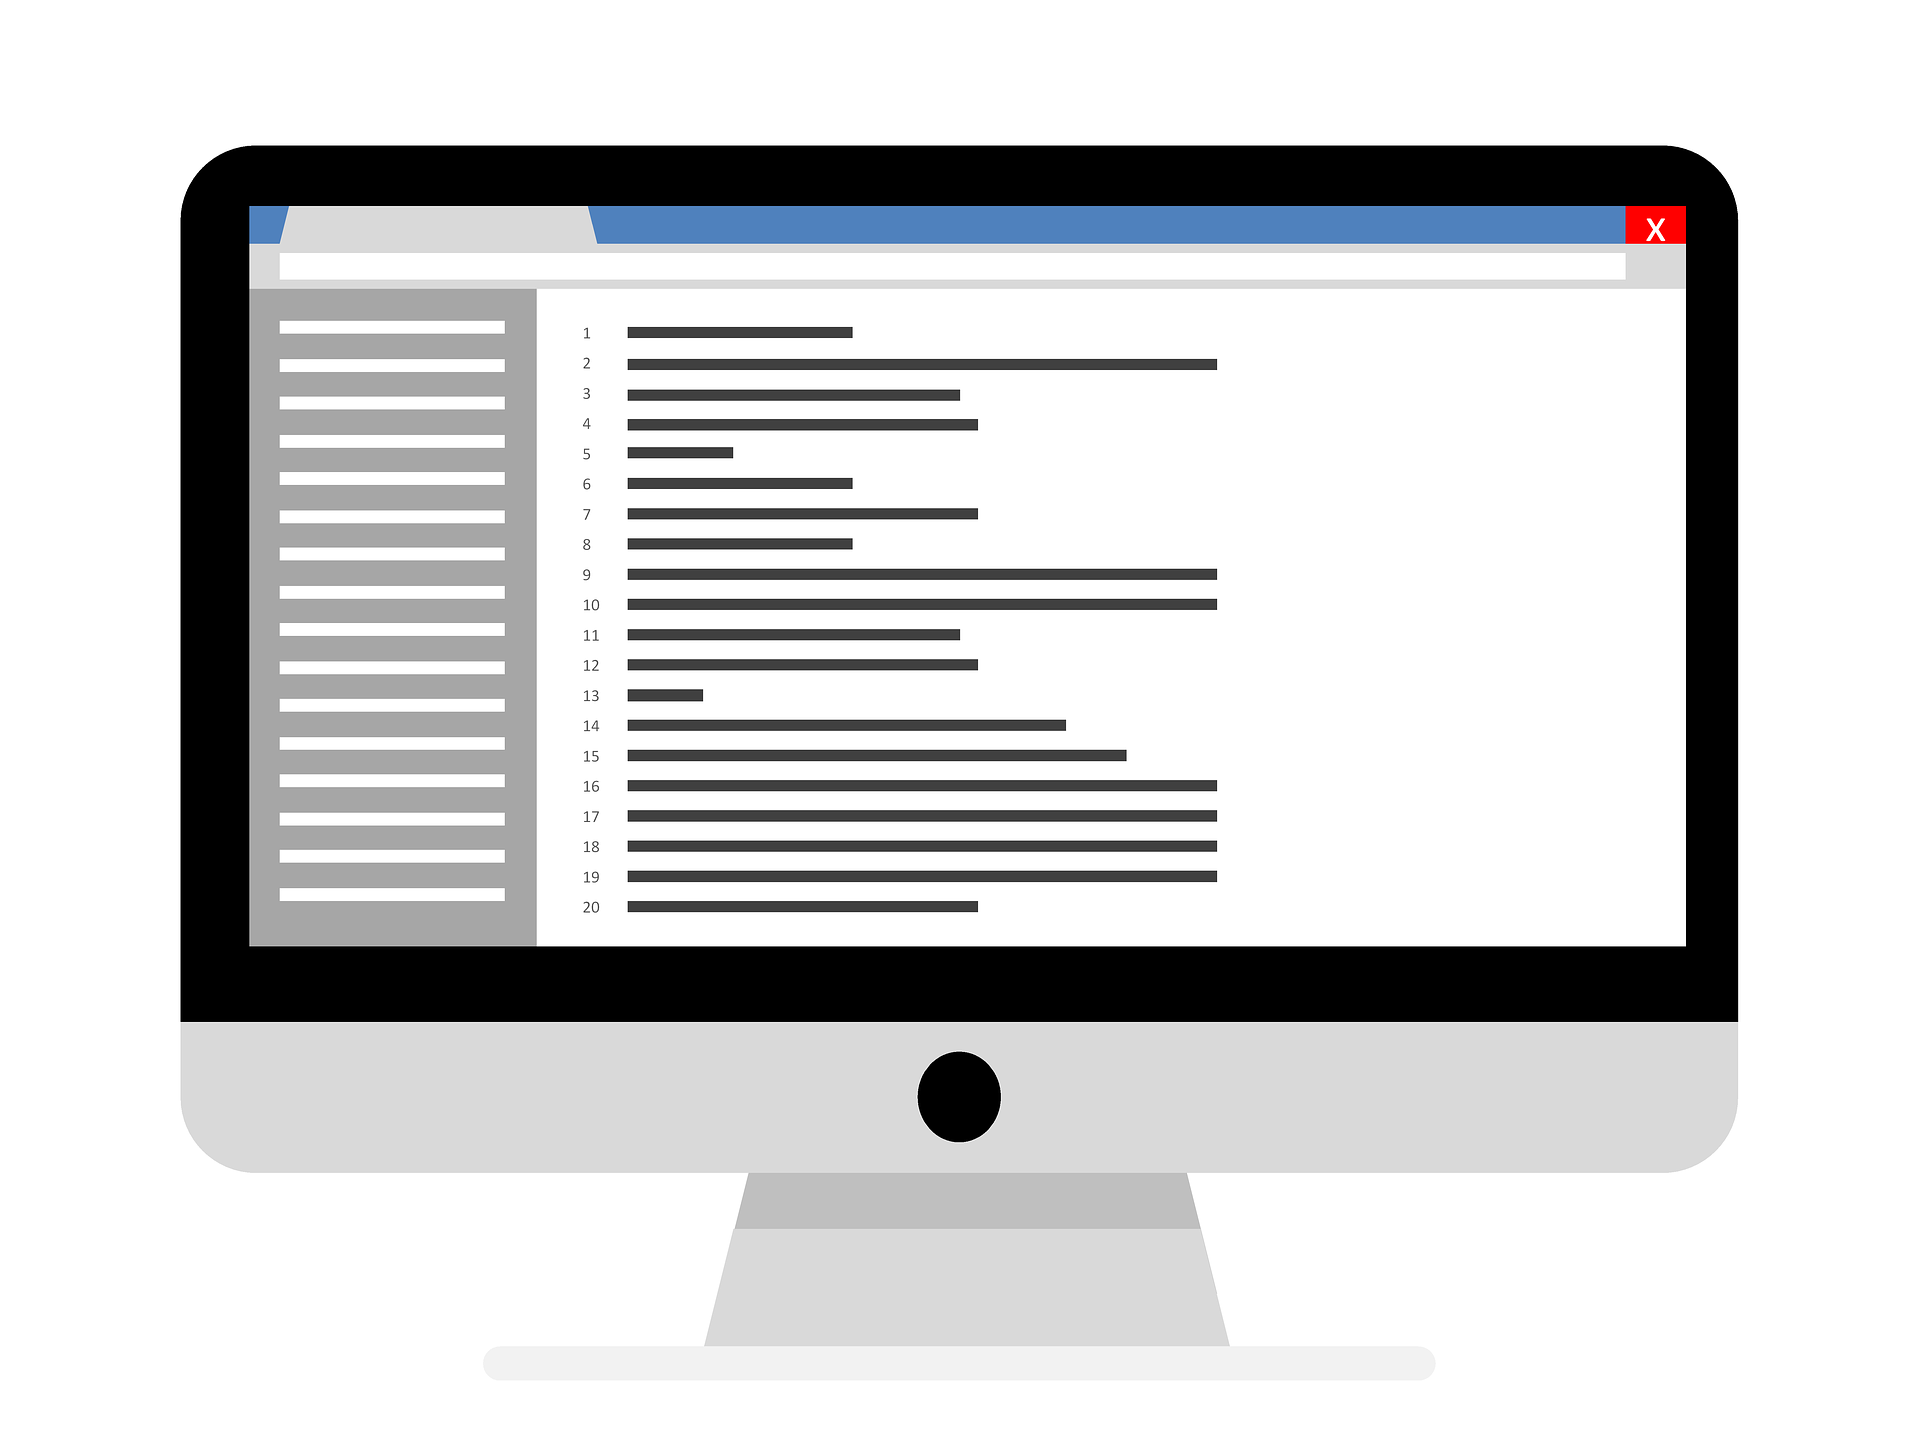 Excelマクロにおける基本文法(繰り返しと分岐)